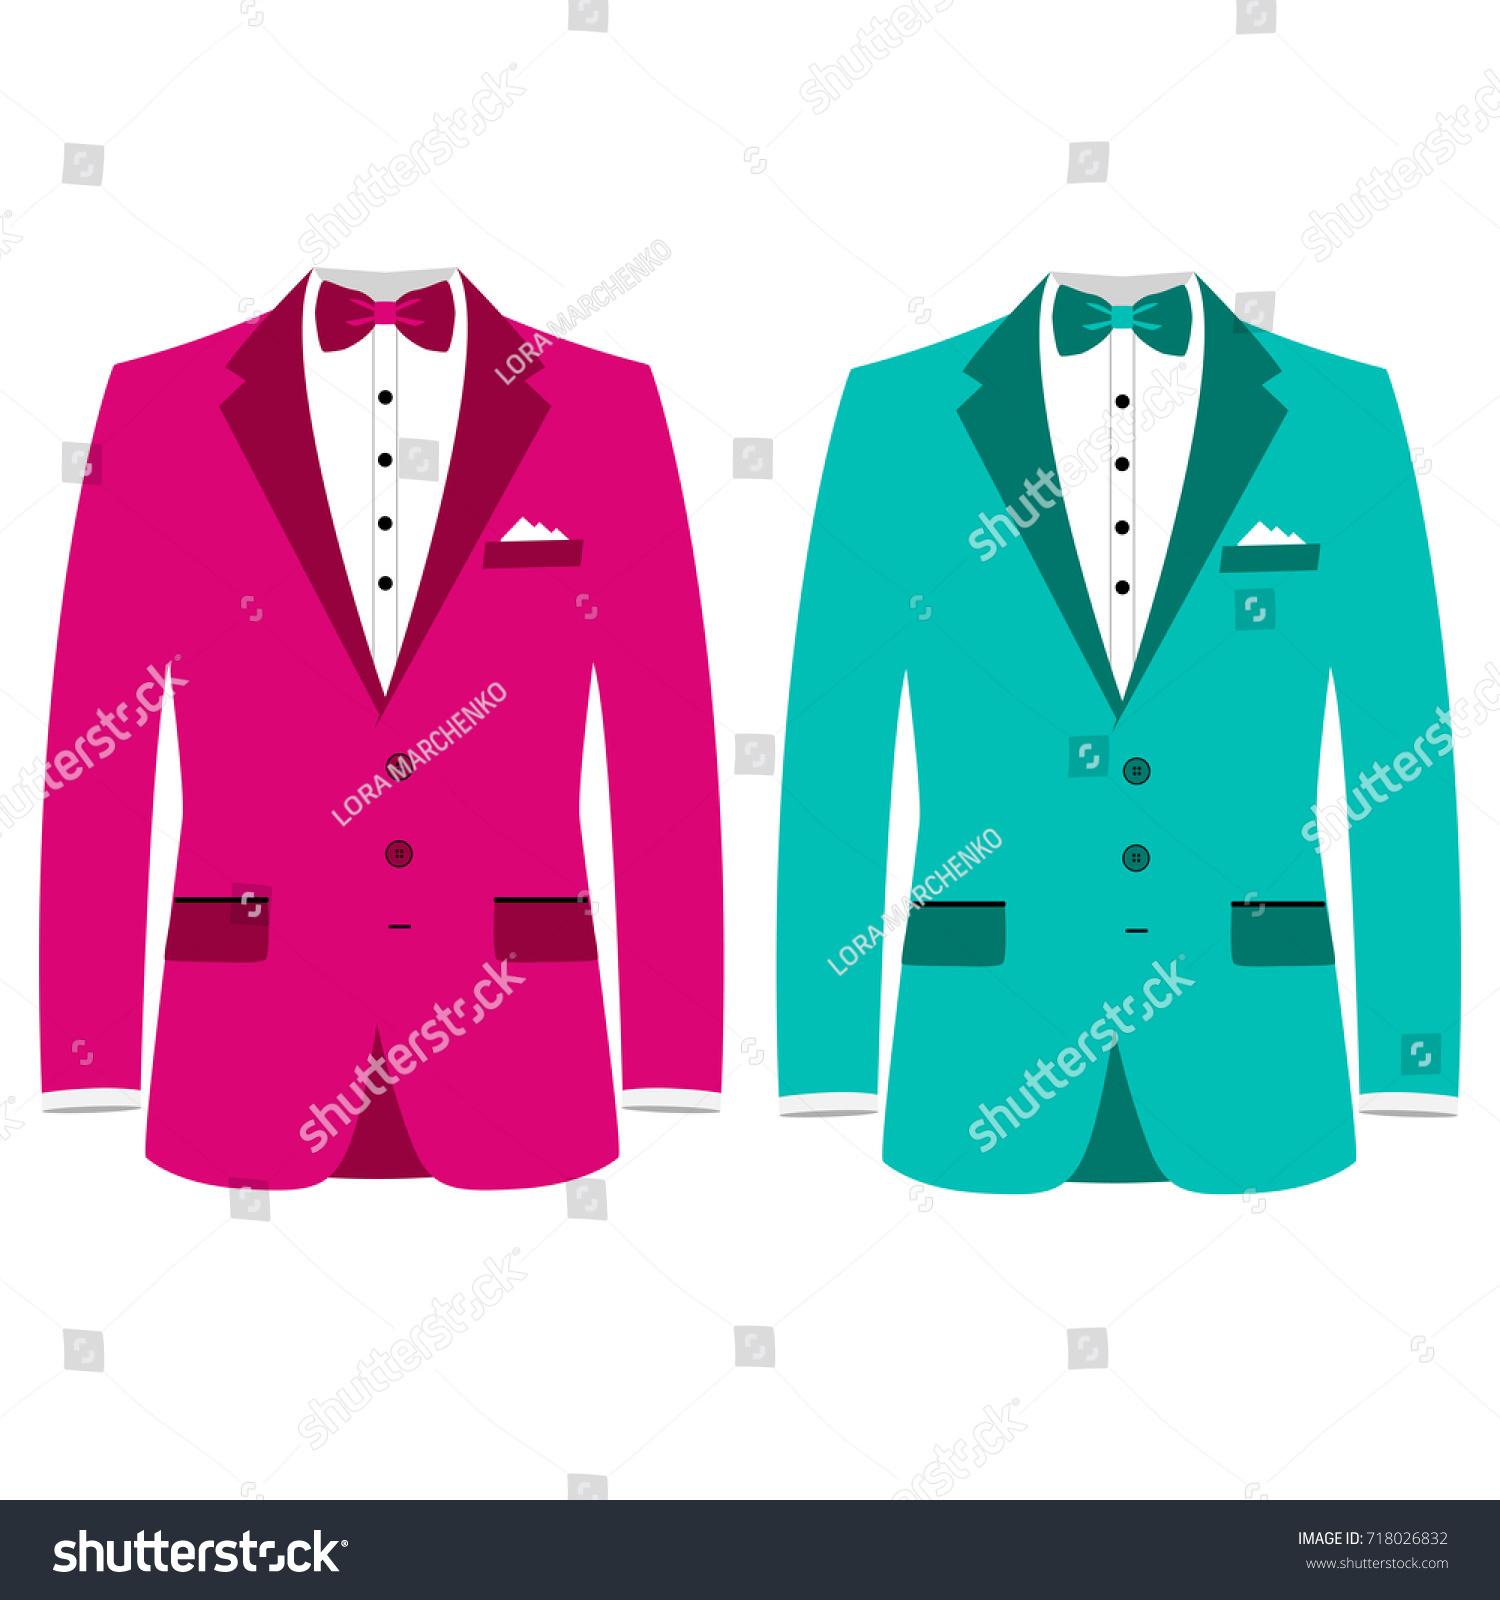 Contemporáneo Wedding Tuxedo Suits For Men Galería - Colección de ...